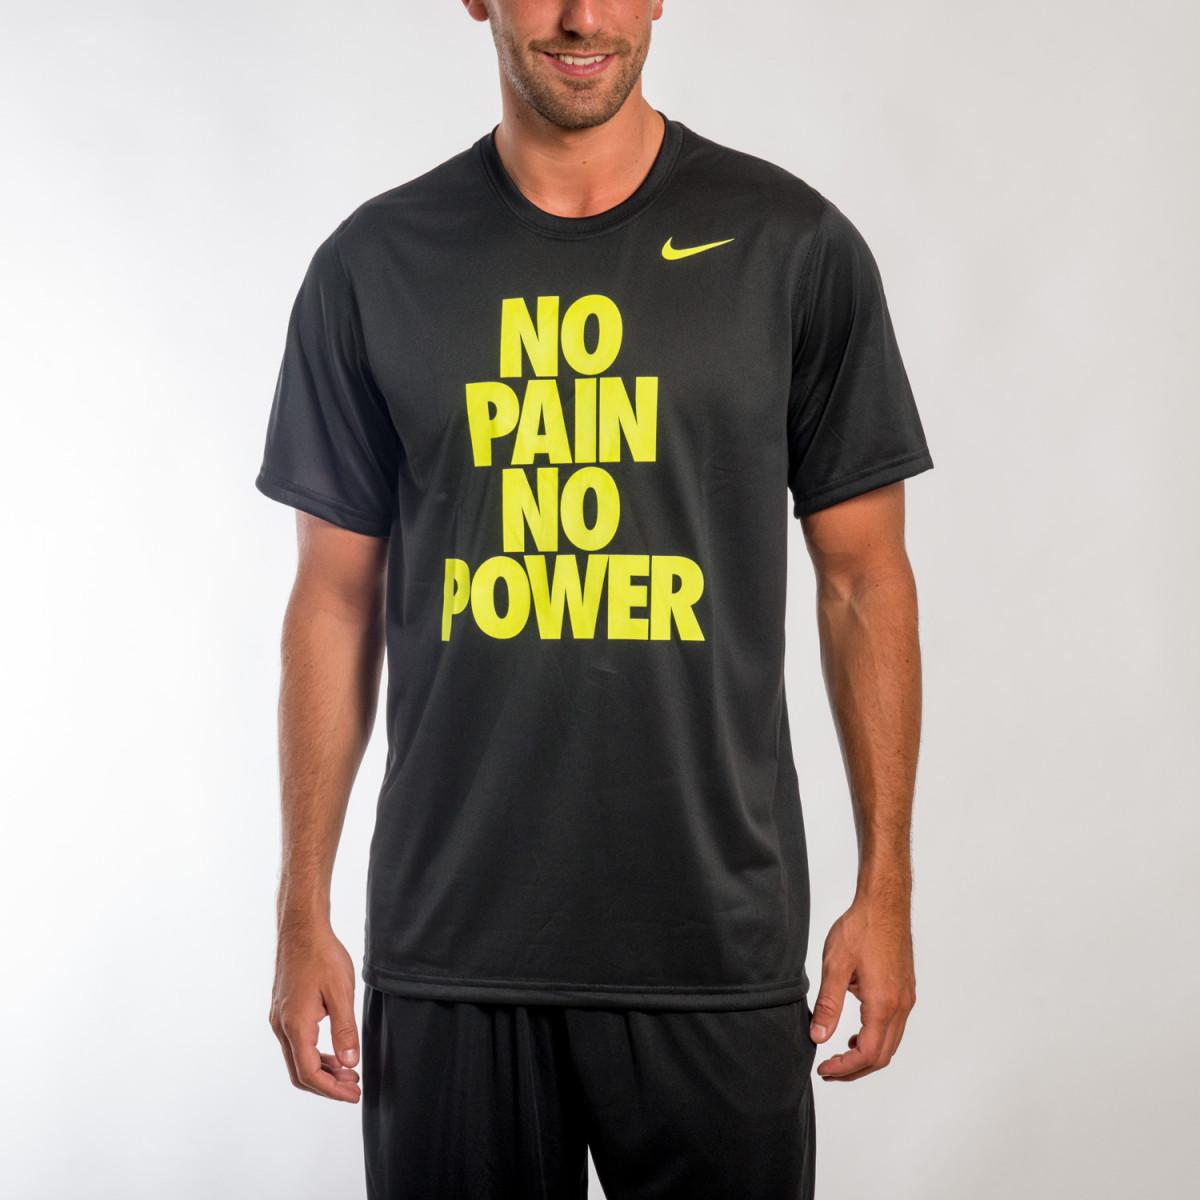 REMERA NIKE LEG NO PAIN NO POWER